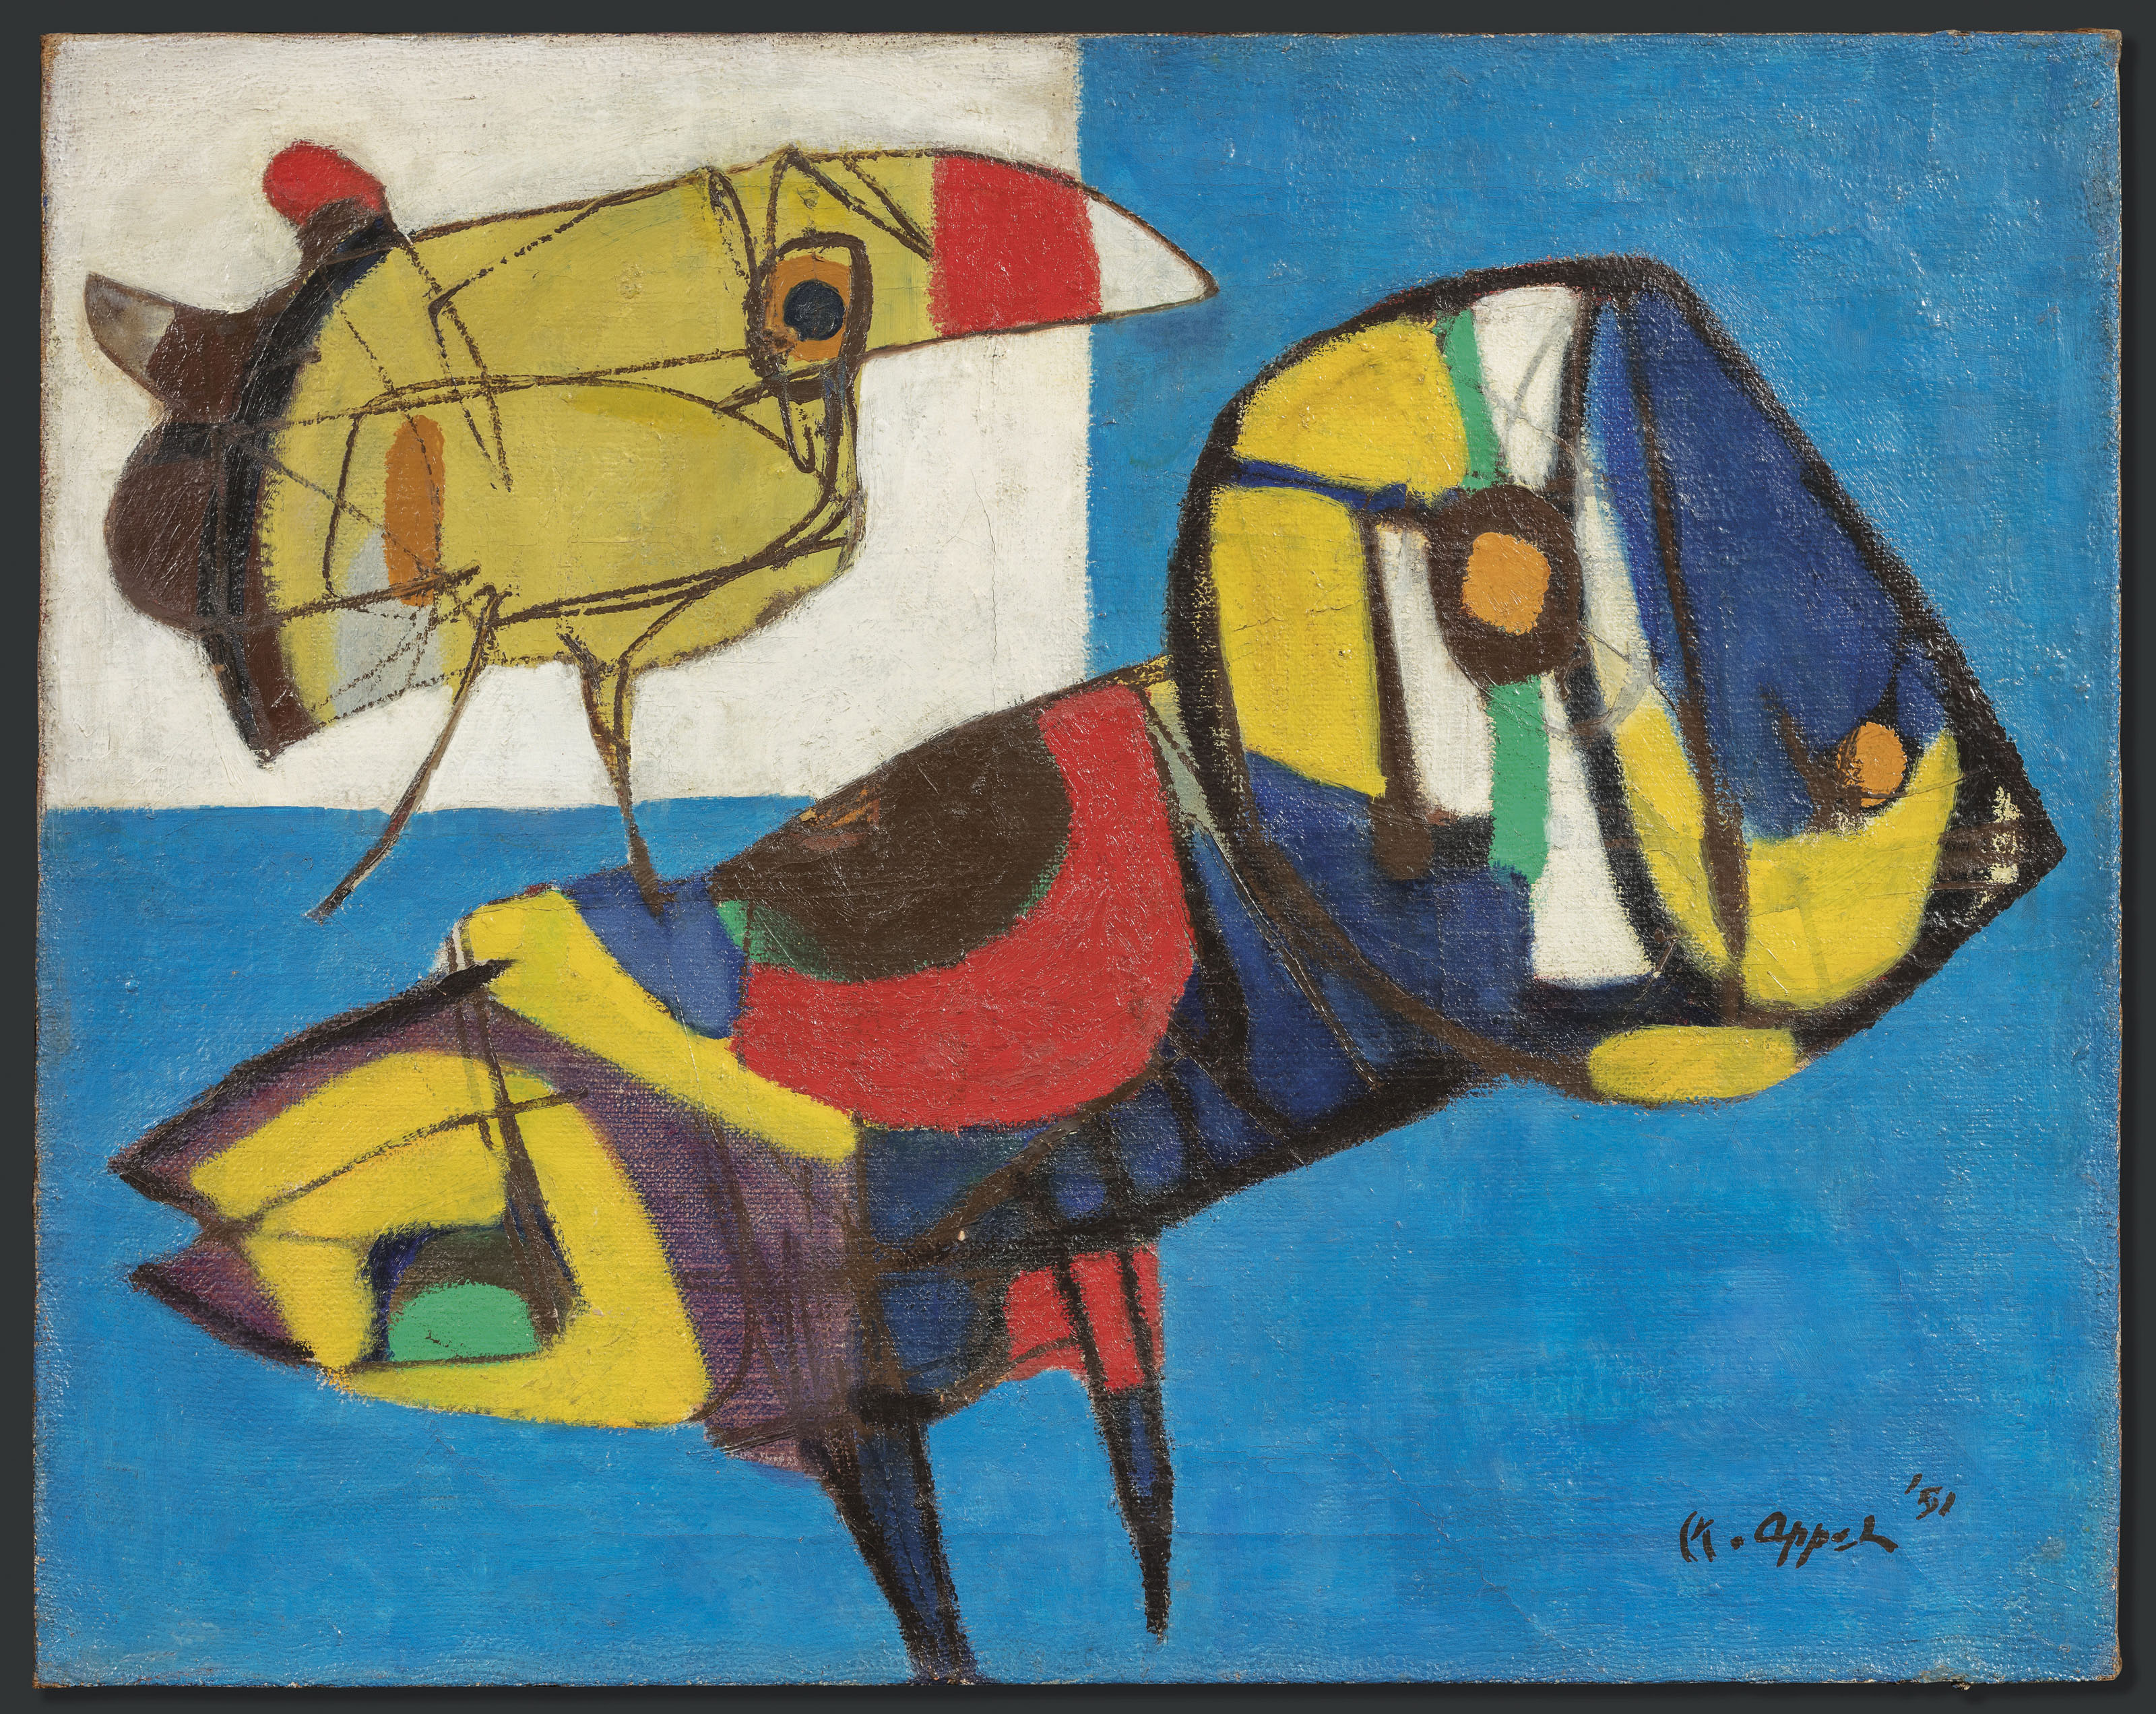 The CoBrA Art Collective: 'The Last True Avant-garde Art Movement